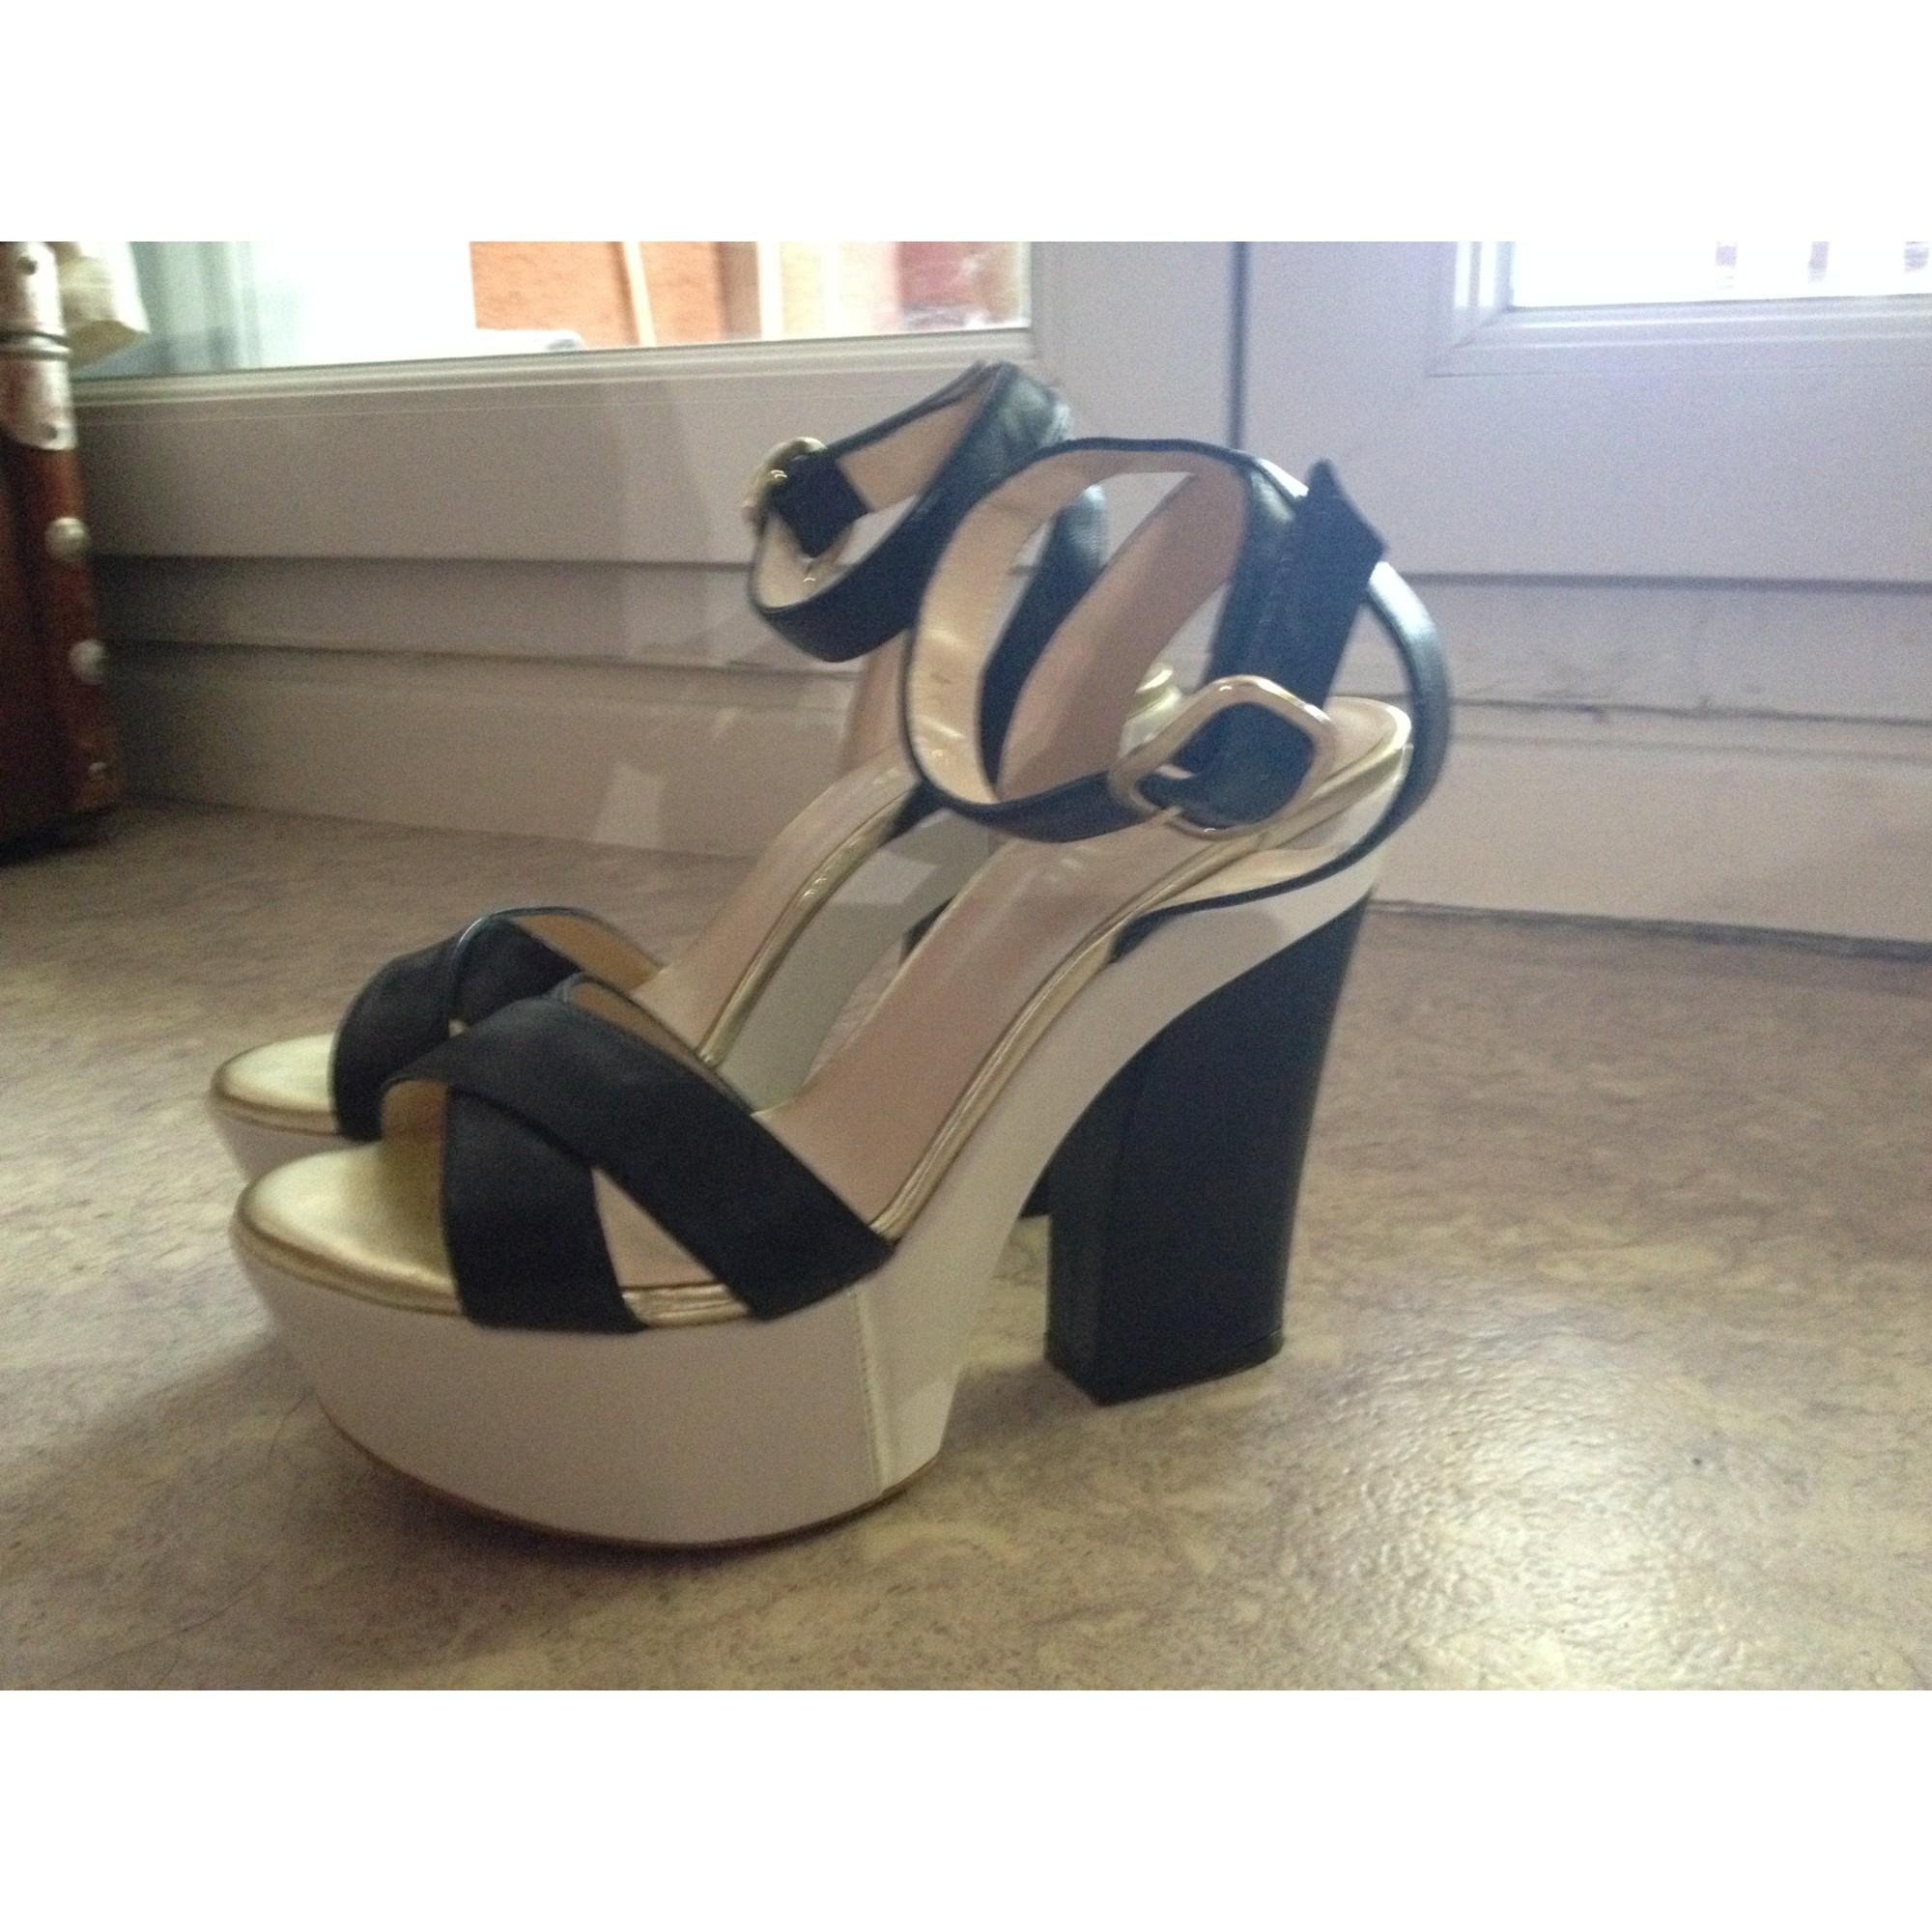 1157b29b837 Sandales compensées MINELLI 37 bleu - 5591620